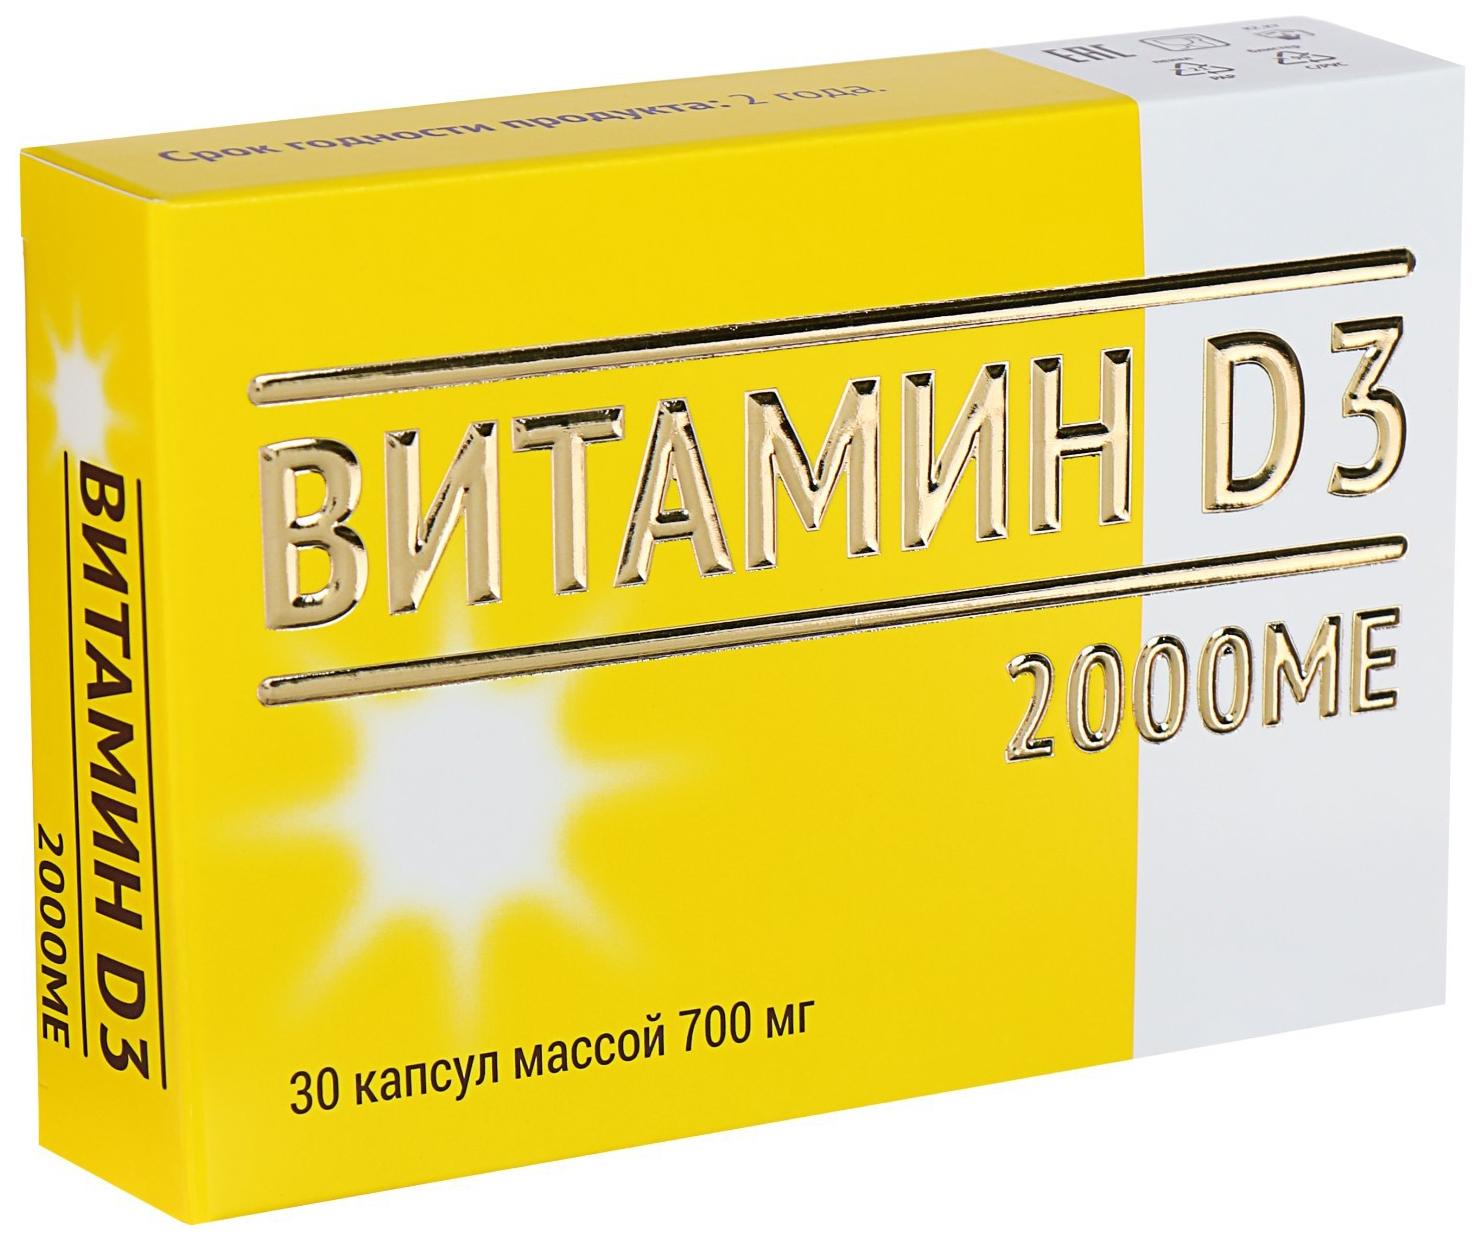 Гроссхертц Витамин Д3 2000МЕ капсулы №30